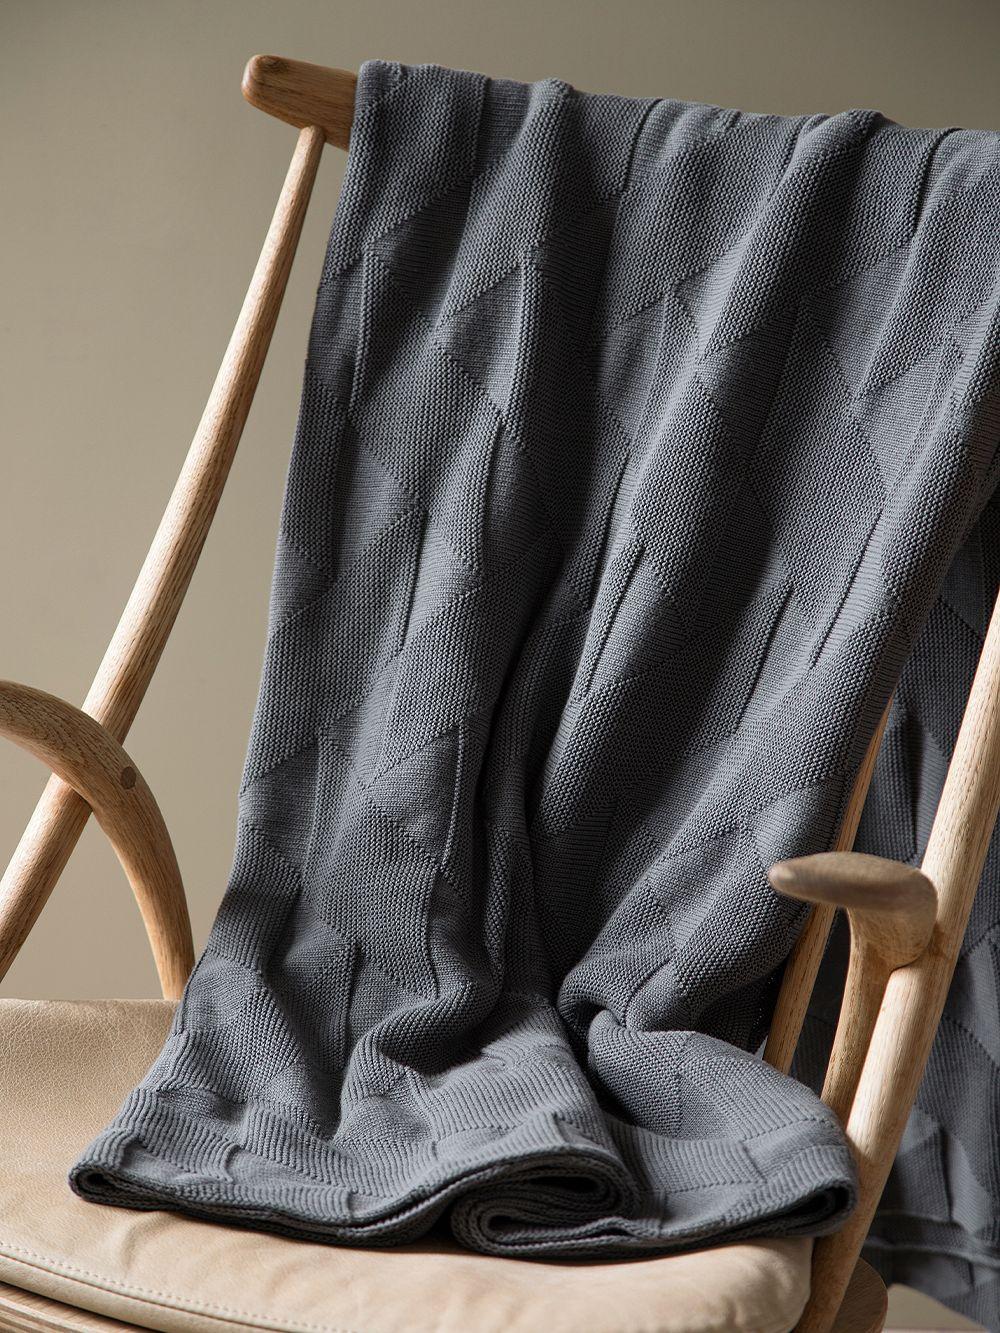 Architectmade FJ Pattern blanket, 140 x 210 cm, grey